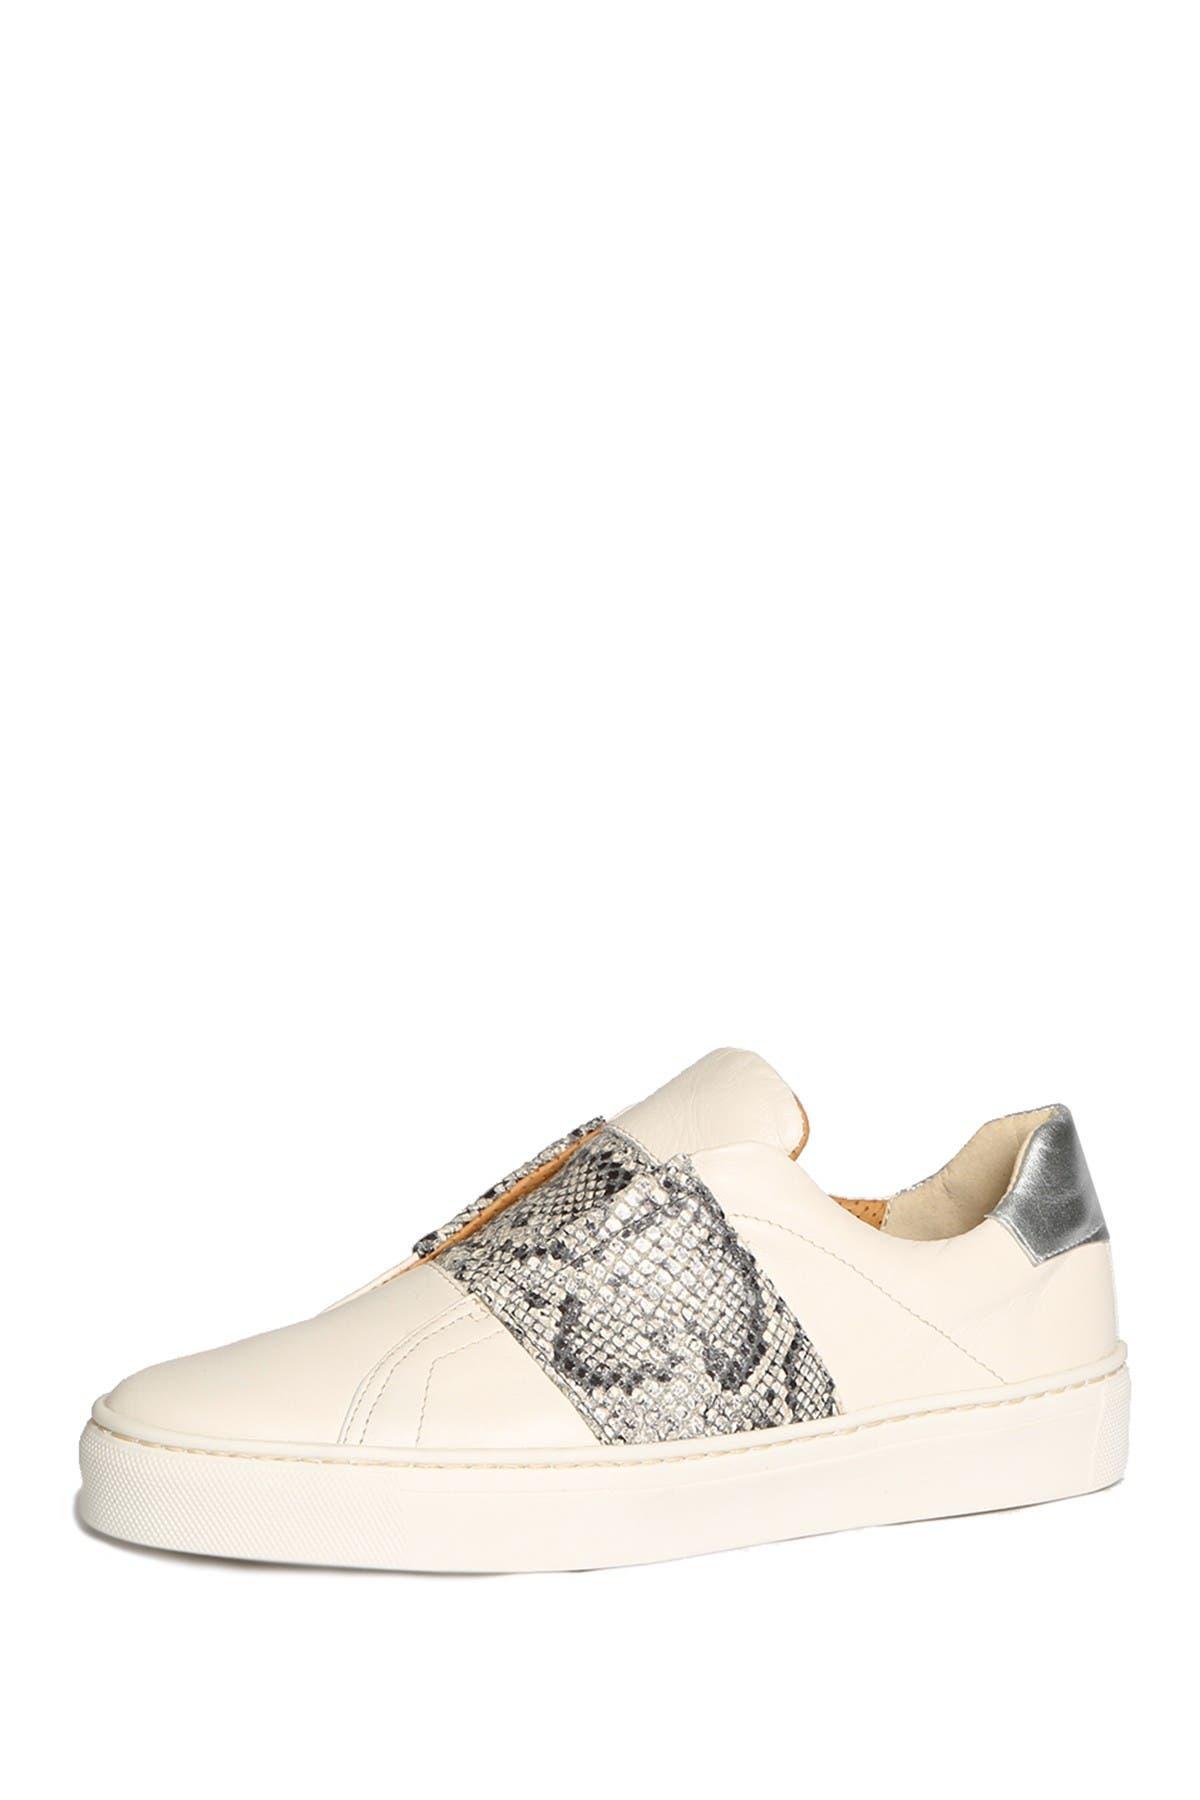 Image of THE FLEXX Commuter Slip-On Sneaker